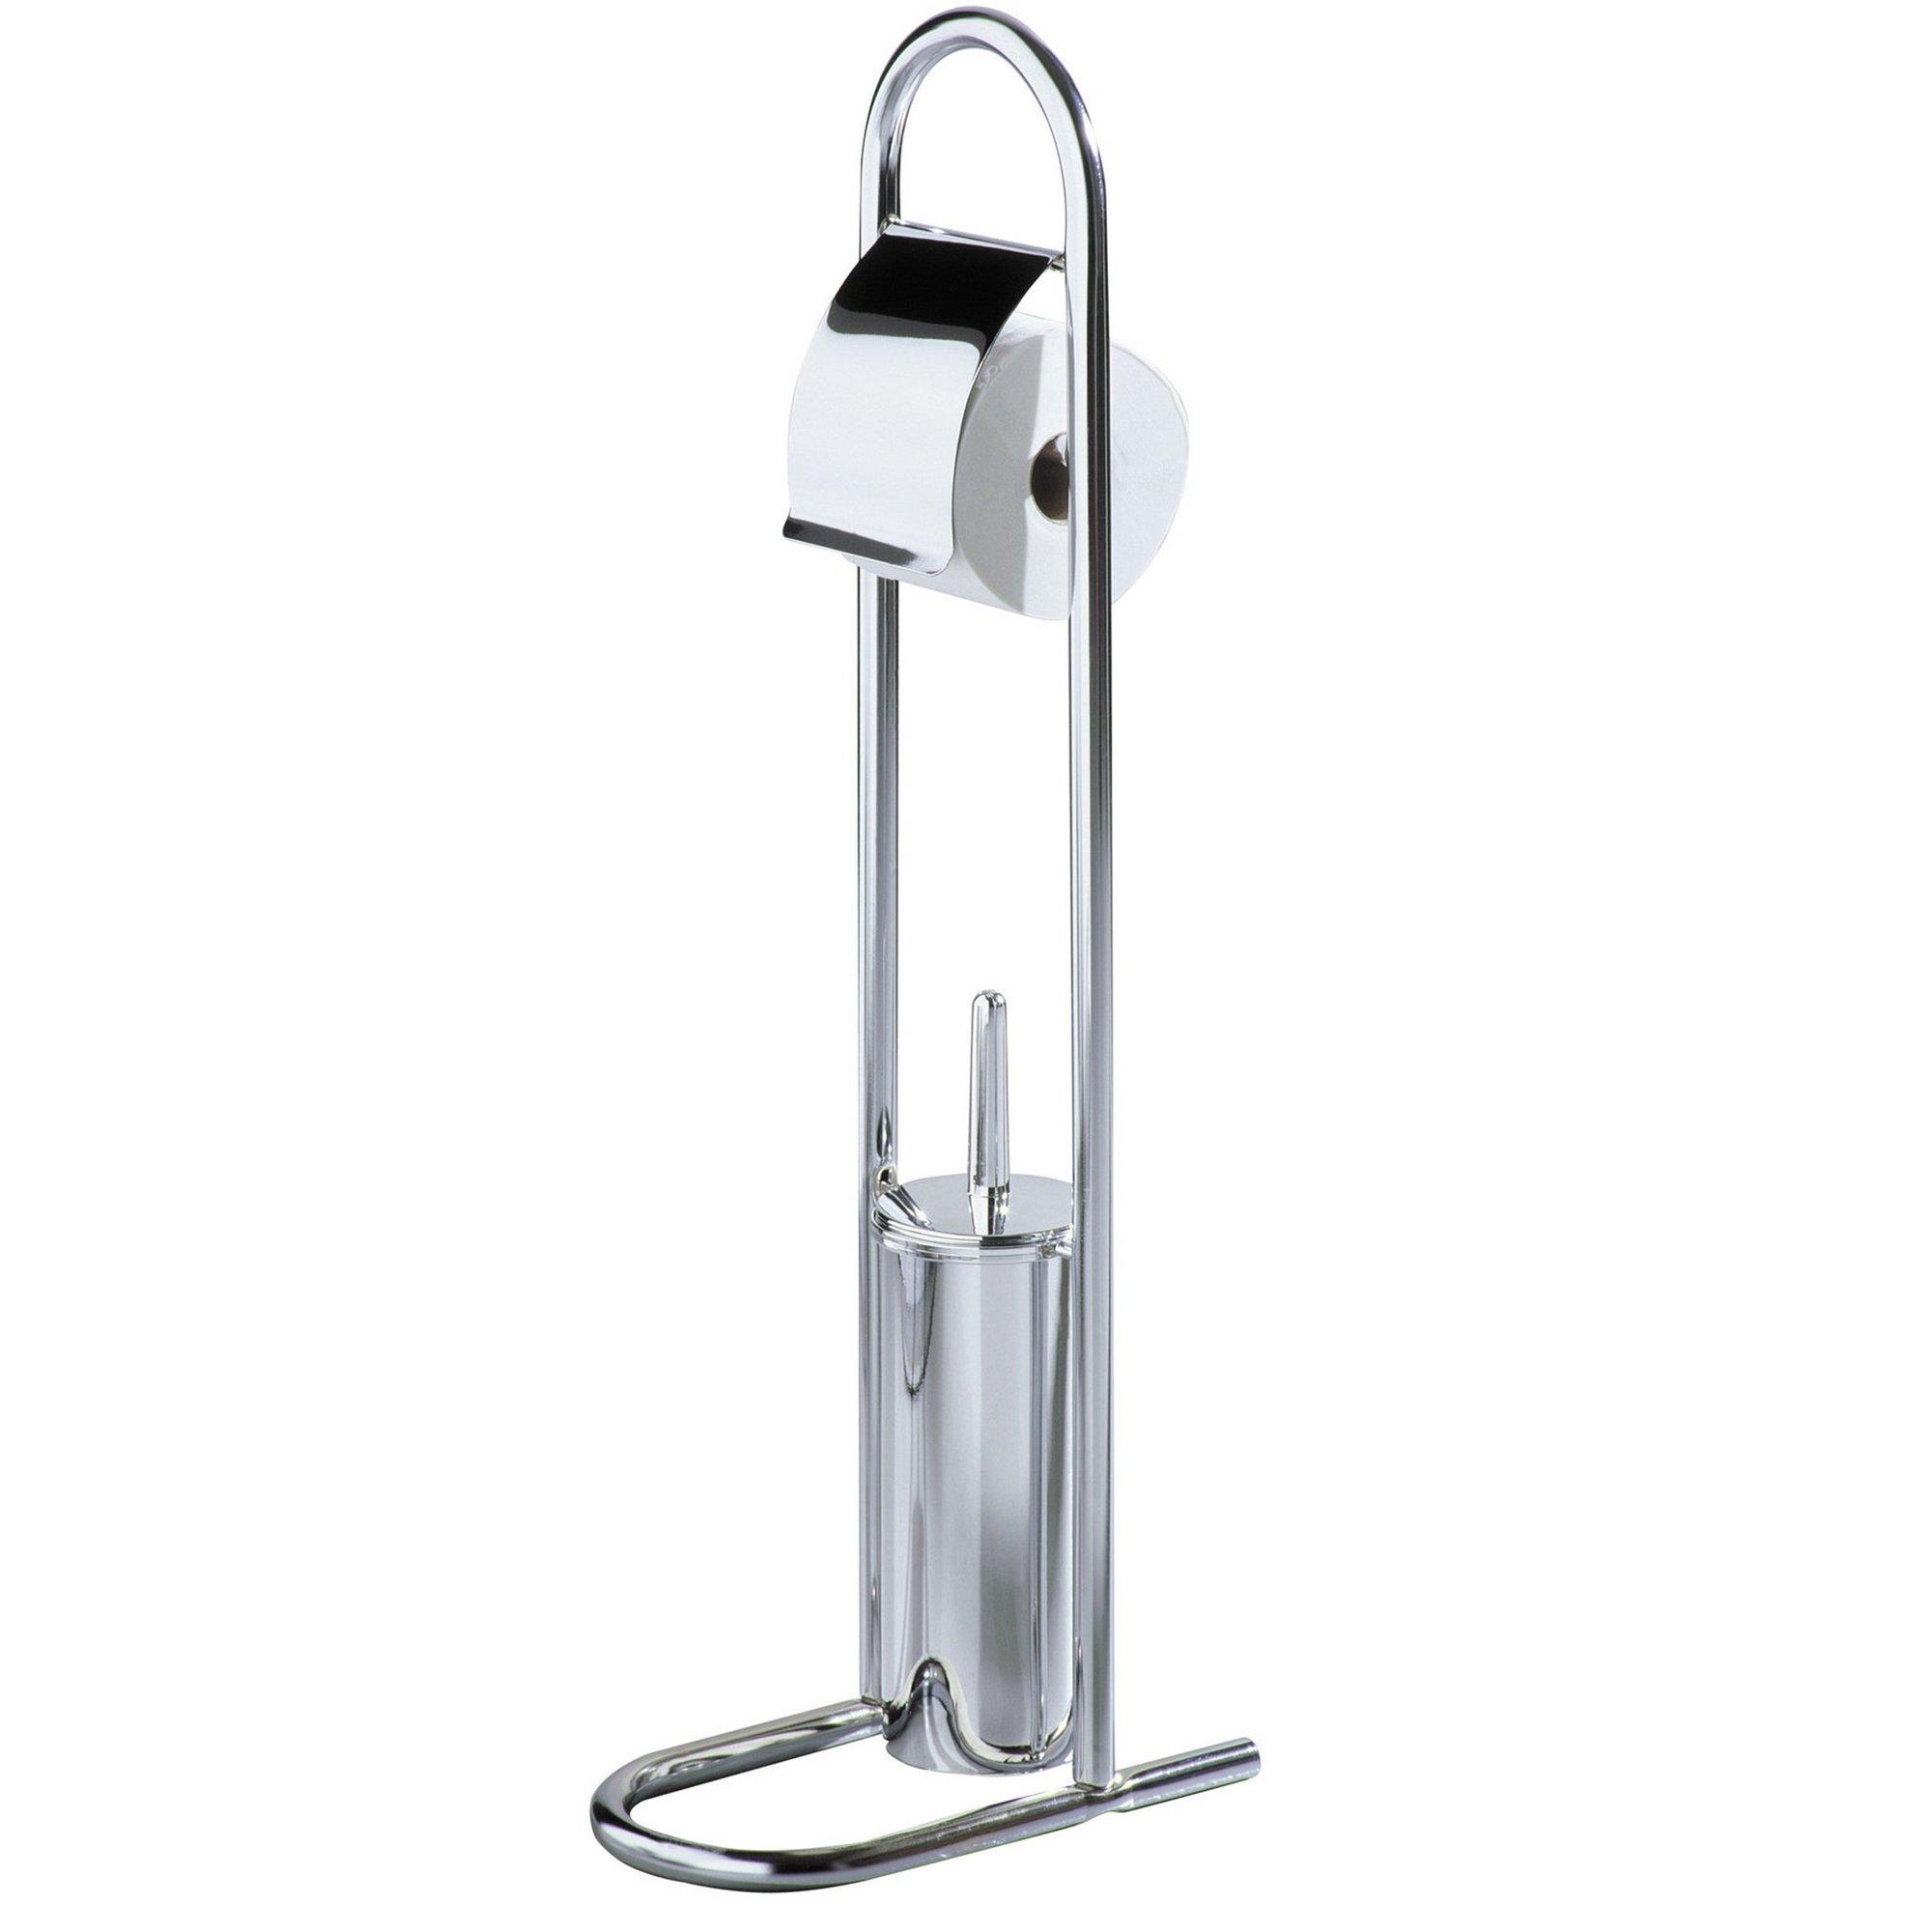 Image of Chrome Toilet Brush and Roll Holder